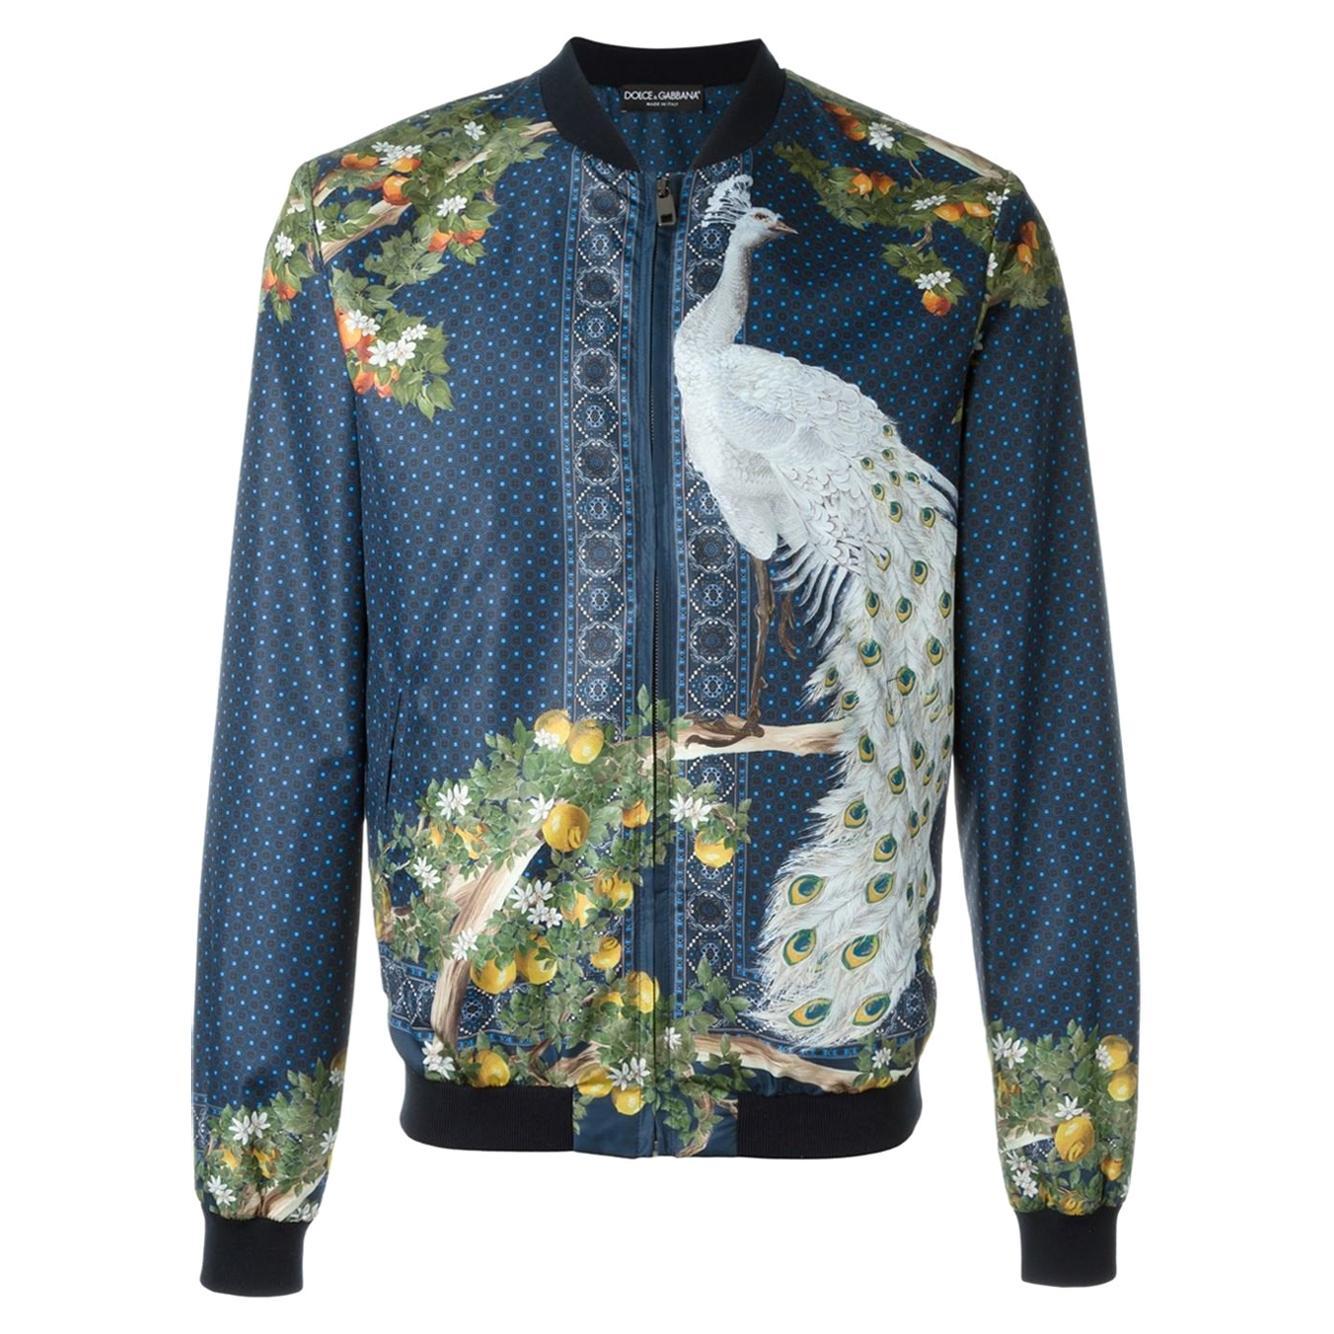 Dolce & Gabbana Men's Blue Peacock Print 100% Silk Bomber Jacket